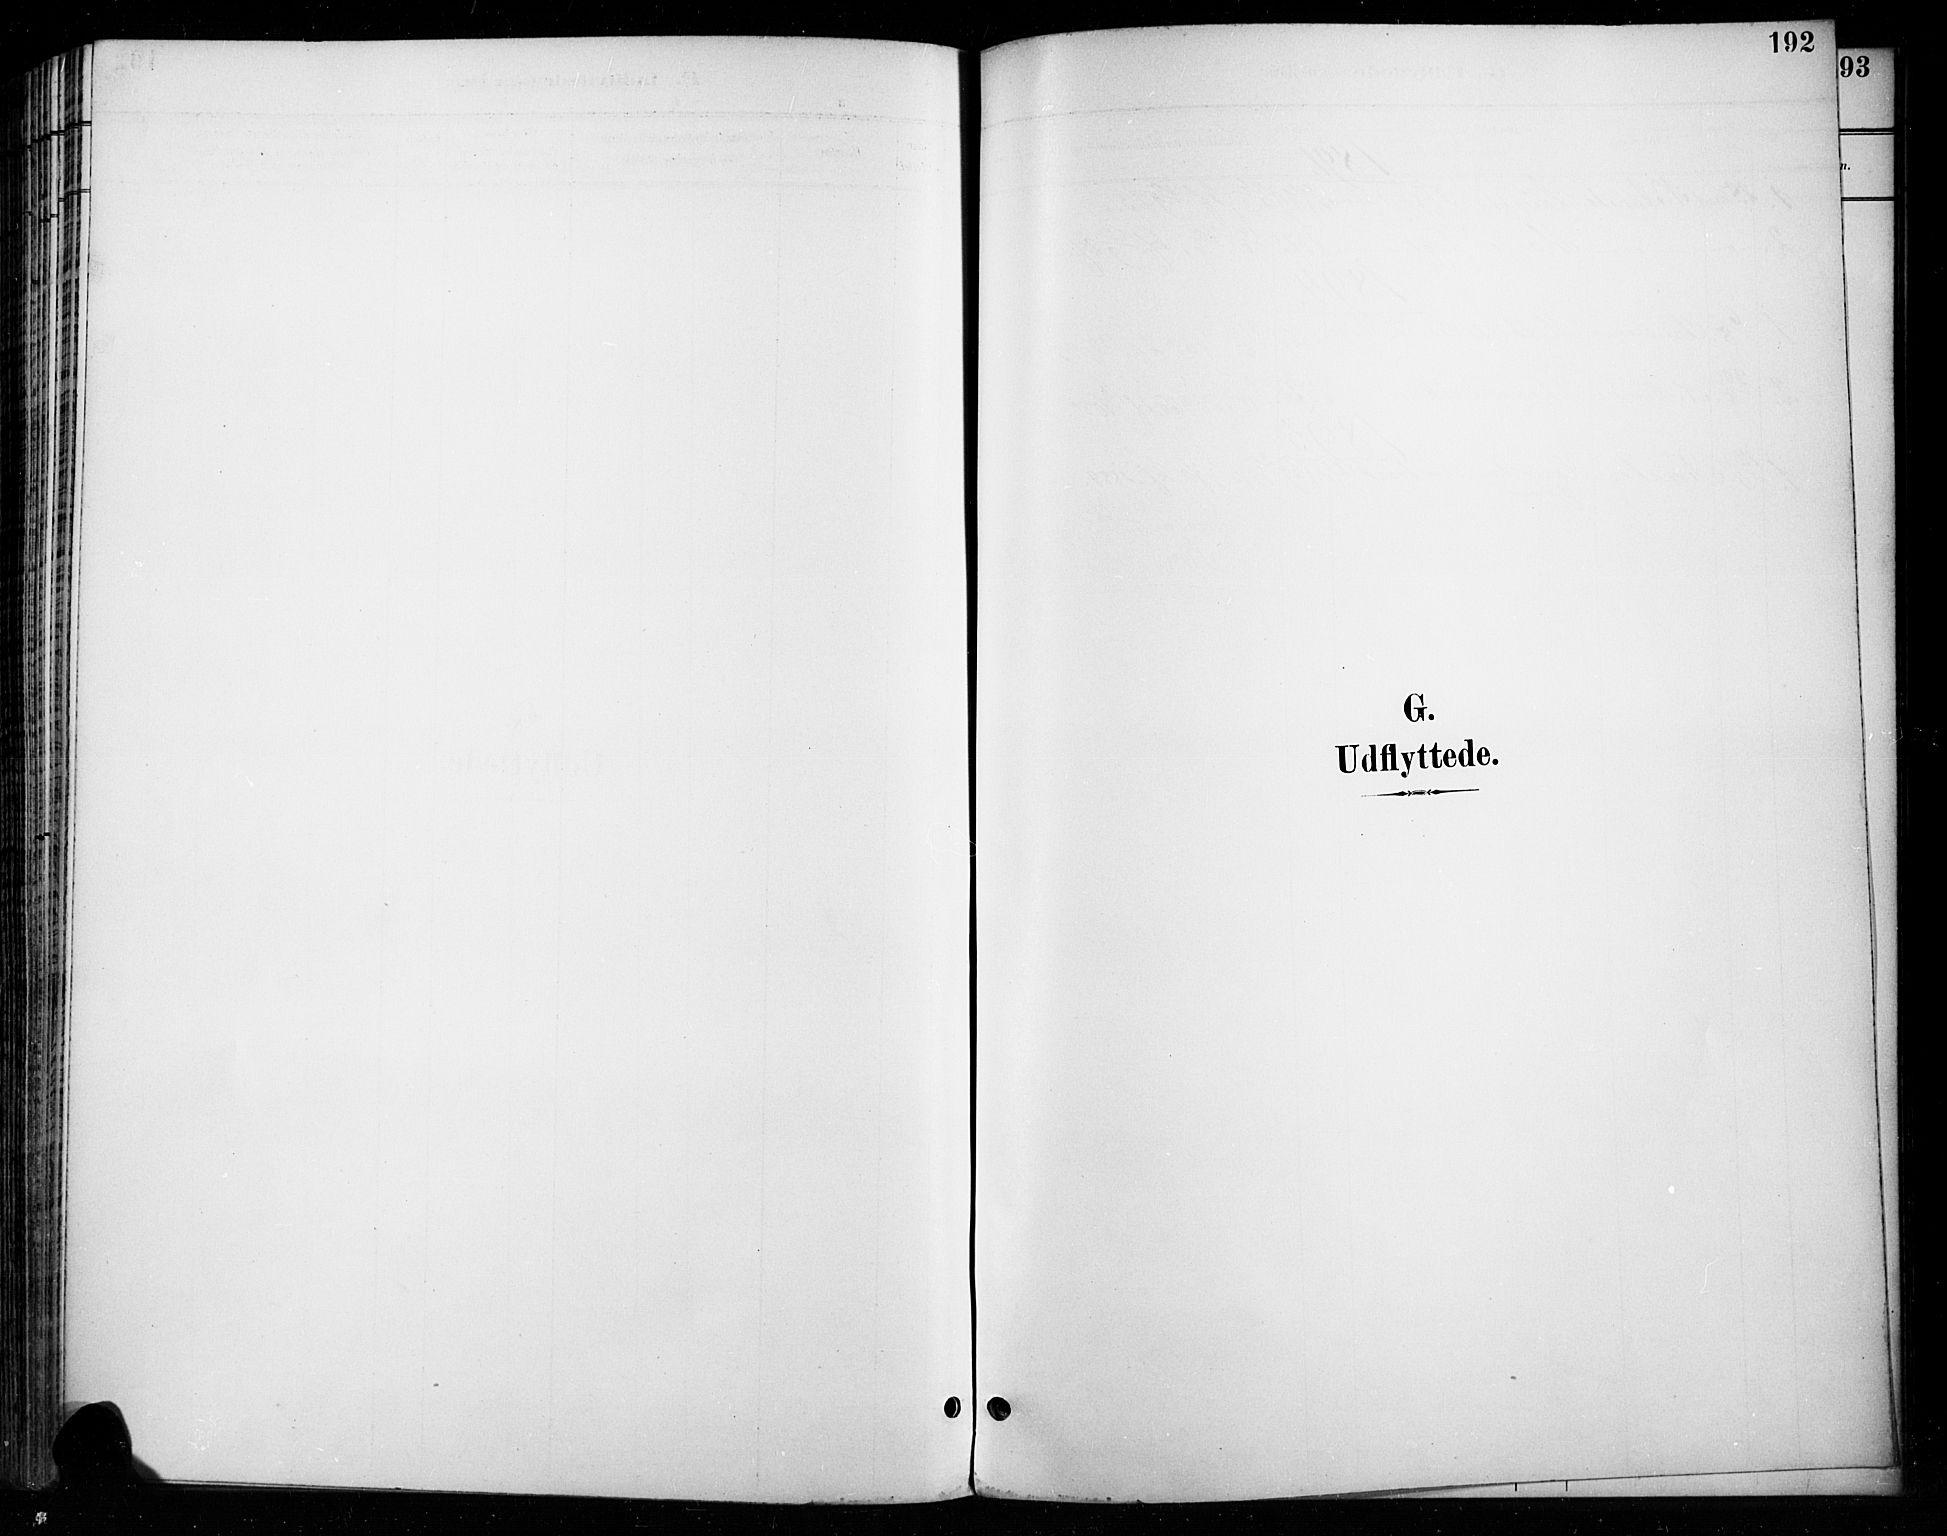 SAH, Vardal prestekontor, H/Ha/Haa/L0011: Ministerialbok nr. 11, 1891-1901, s. 192